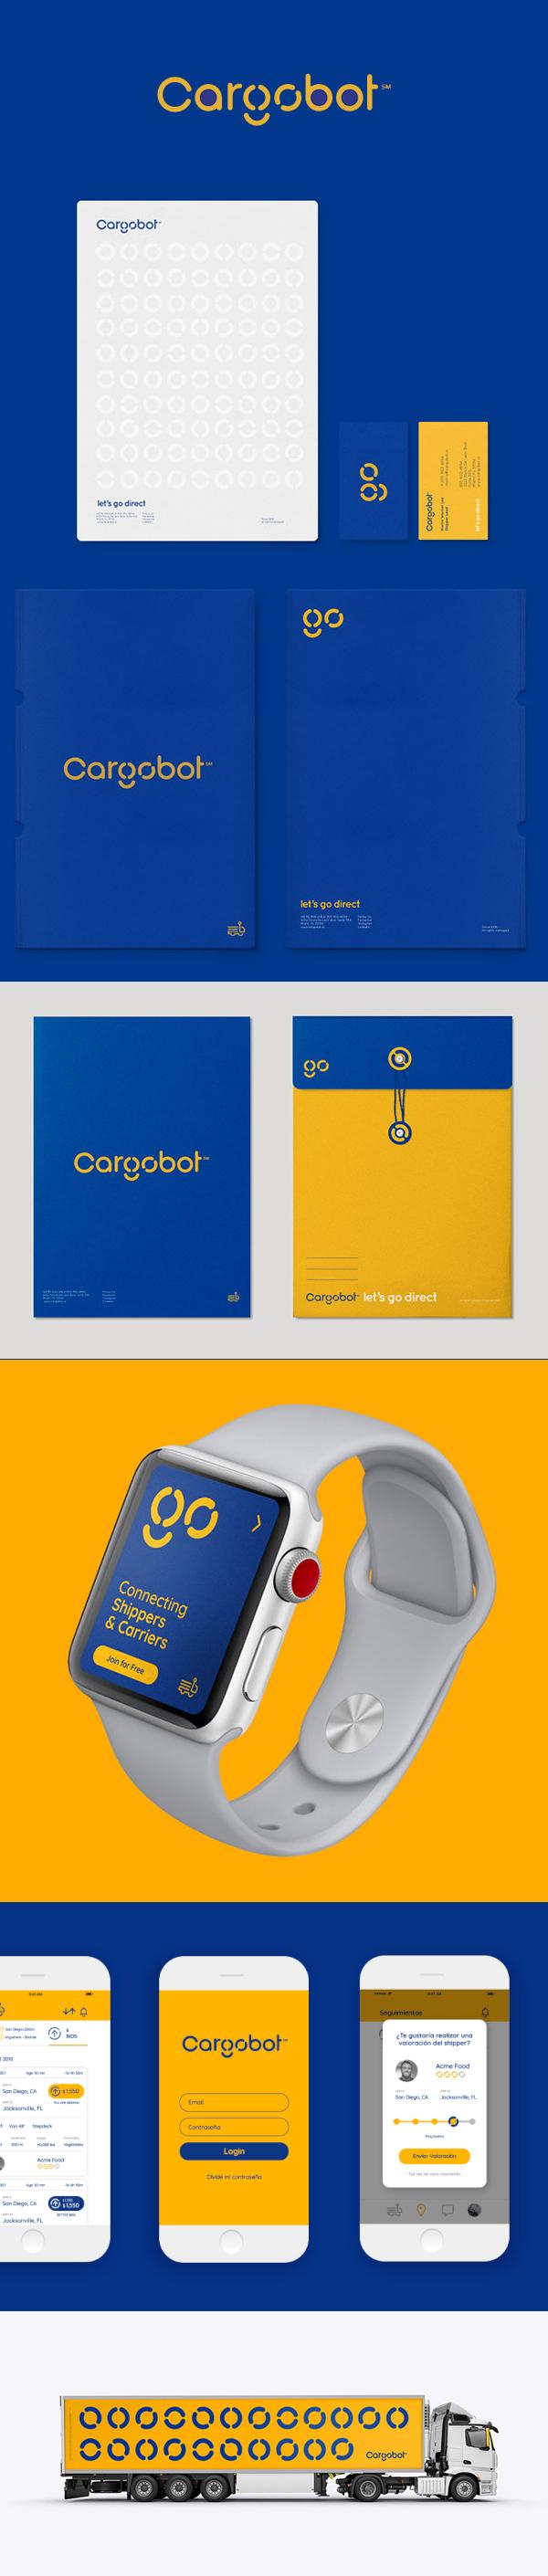 Branding: Cargobot Digital Global Branding by hachetresele